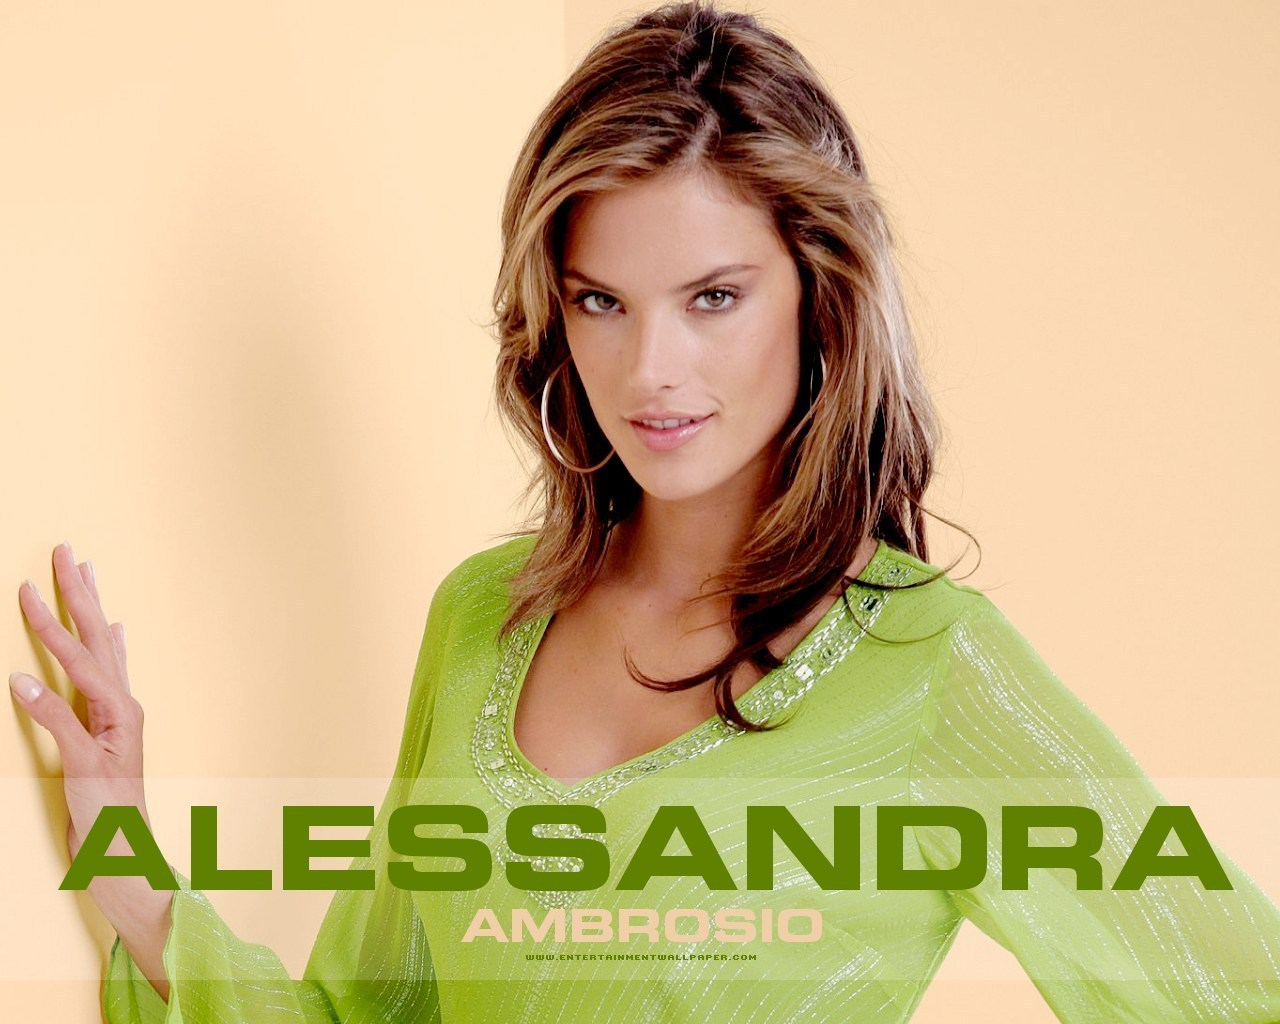 http://3.bp.blogspot.com/-S0qLn9sS16o/Tuj4fbnPrpI/AAAAAAAASUk/nsWY9oSOJ54/s1600/Alessandra-Ambrosio-Wallpapers-Latest-2.jpg